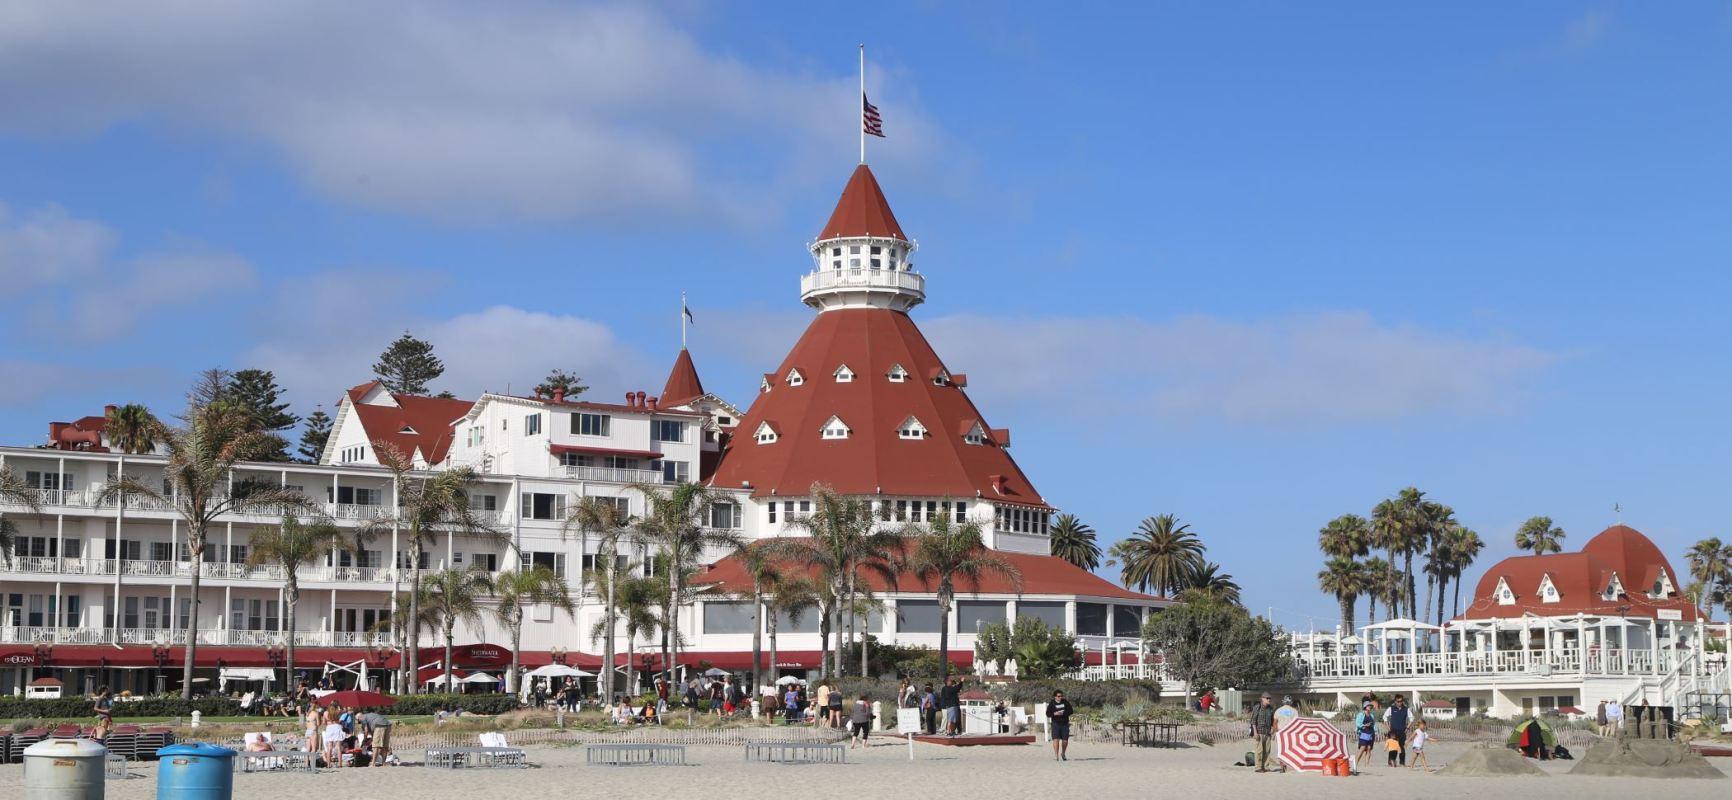 The Best San Diego Date Ideas